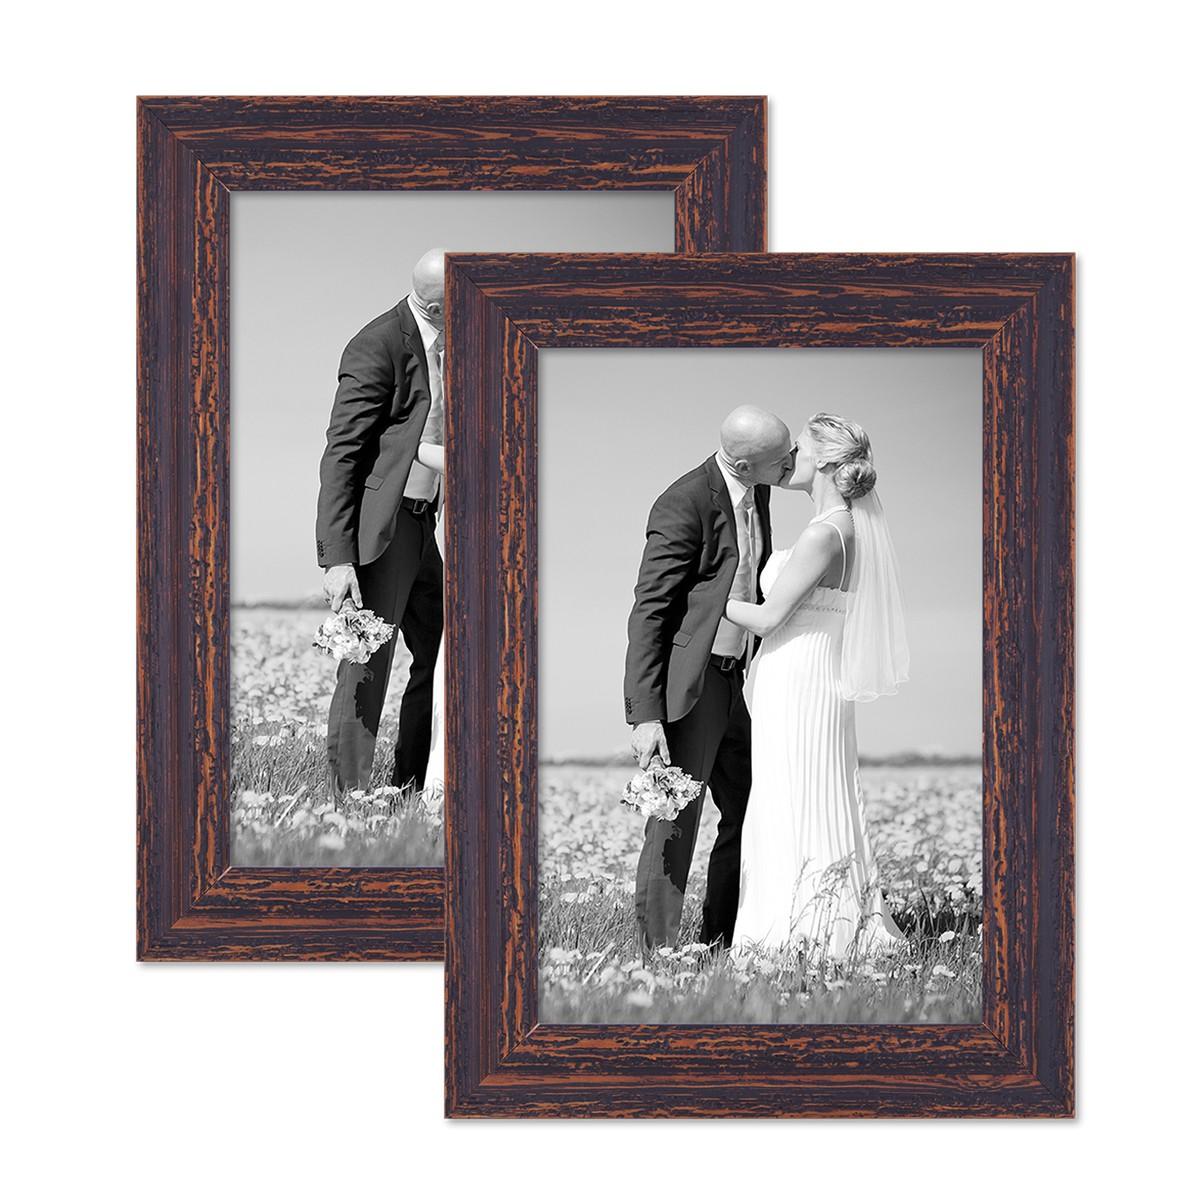 2er bilderrahmen set shabby chic vintage holz wei grau dunkel braun foto rahmen ebay. Black Bedroom Furniture Sets. Home Design Ideas